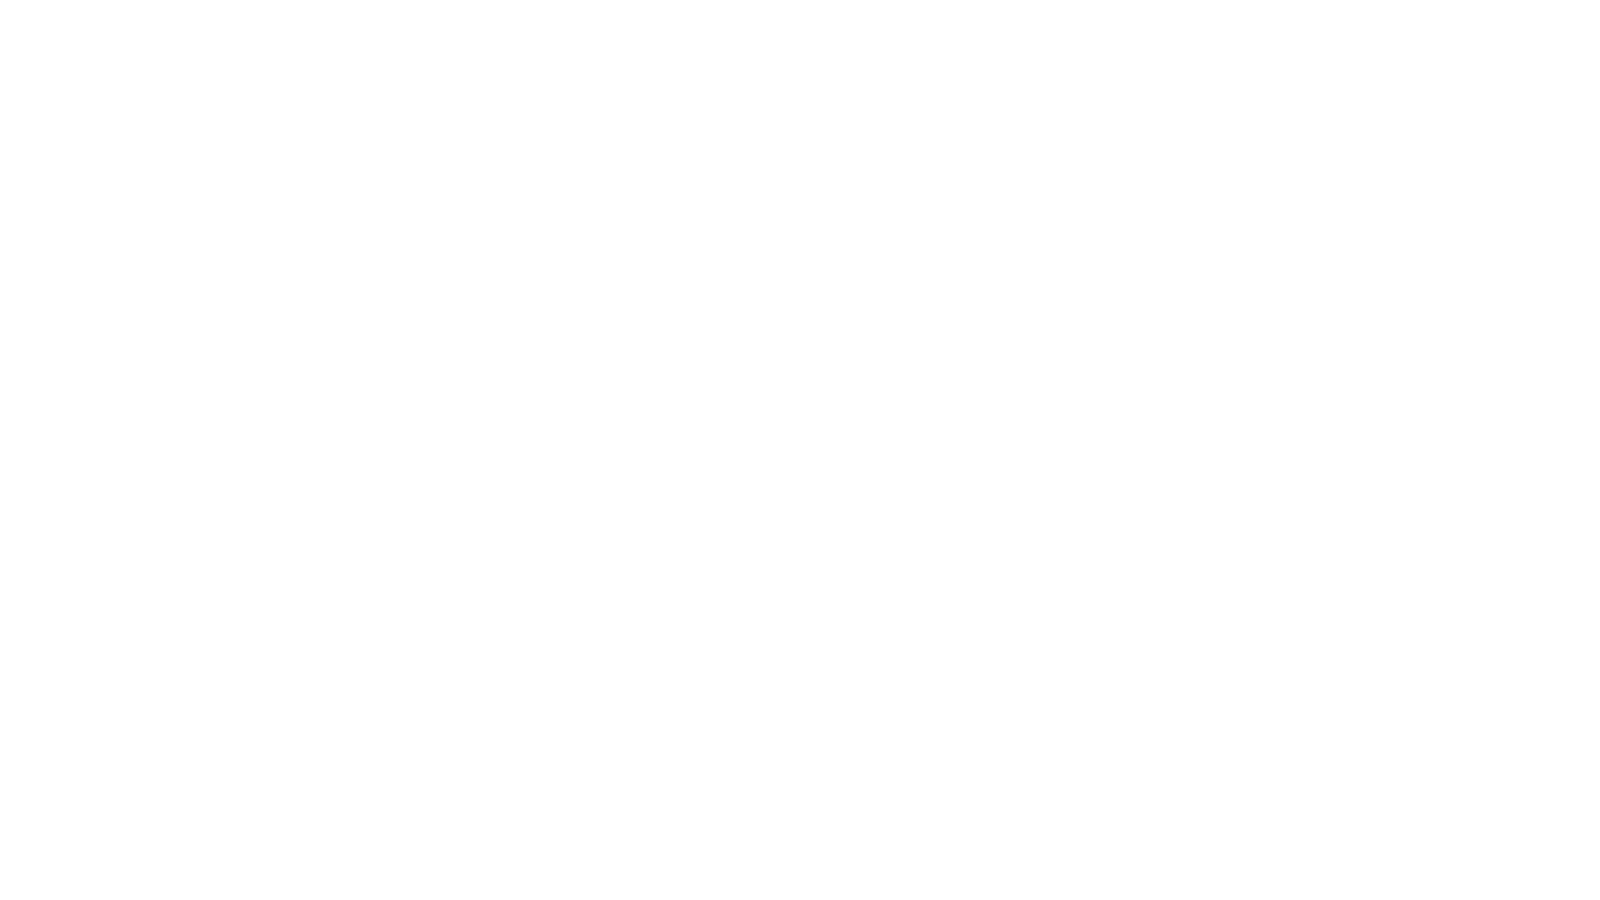 Live rendition of Hannah Stone's It's Raining, featuring Junaco  Vocals, Synth Bass - Hannah Stone Vocals, Synthesizer - Shahana Jaffer Guitar, Drum Programming - Joey La Rosa Rubber-bridge Guitar - Tejas Leier Heyden  Video edited by Jayden Becker Engineered by Joey La Rosa Mixed by Tejas Leier Heyden   Junaco https://www.junacomusic.com https://www.instagram.com/junacomusic/ https://www.youtube.com/watch?v=j6jq6K-mrCo&list=PLtbAx_Dq_wvYIAPvAX1OVD0AAdv_arLmf&index=2 https://open.spotify.com/artist/6Q3I3yOdG7MhwX6BCWiu0e?si=0-vR5CHISi-ak9VNzxJQXg&dl_branch=1  Hannah Stone https://hannahstonemusic.com https://www.instagram.com/hannybigstones/ https://www.youtube.com/channel/UCAjrBjnGlZCJ_razhC4BpbA https://open.spotify.com/artist/7zAa9GdmlQ0GZT5mUQR0OJ?si=z757jJIvTCKm8zlSMV8KiQ&dl_branch=1  Jayden Becker https://www.instagram.com/jaydenhbecker/ https://www.youtube.com/user/jayden12155056